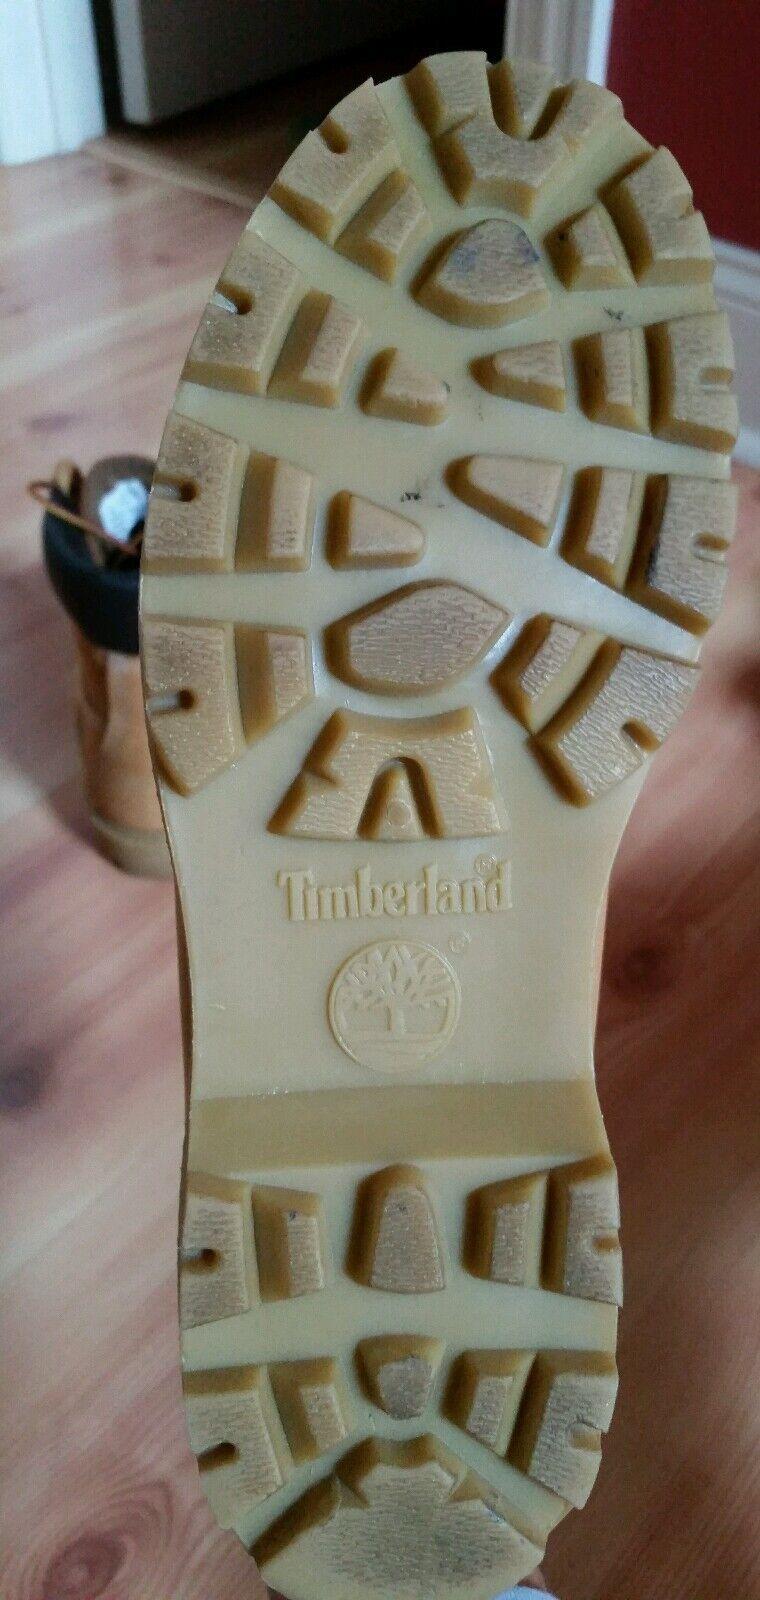 Damenschuhe TIBERLAND WHEAT LEATHER 6 INCH Stiefel WATERPROOF  Stiefel INCH SIZE 7.5 M STYLE 10317 149684